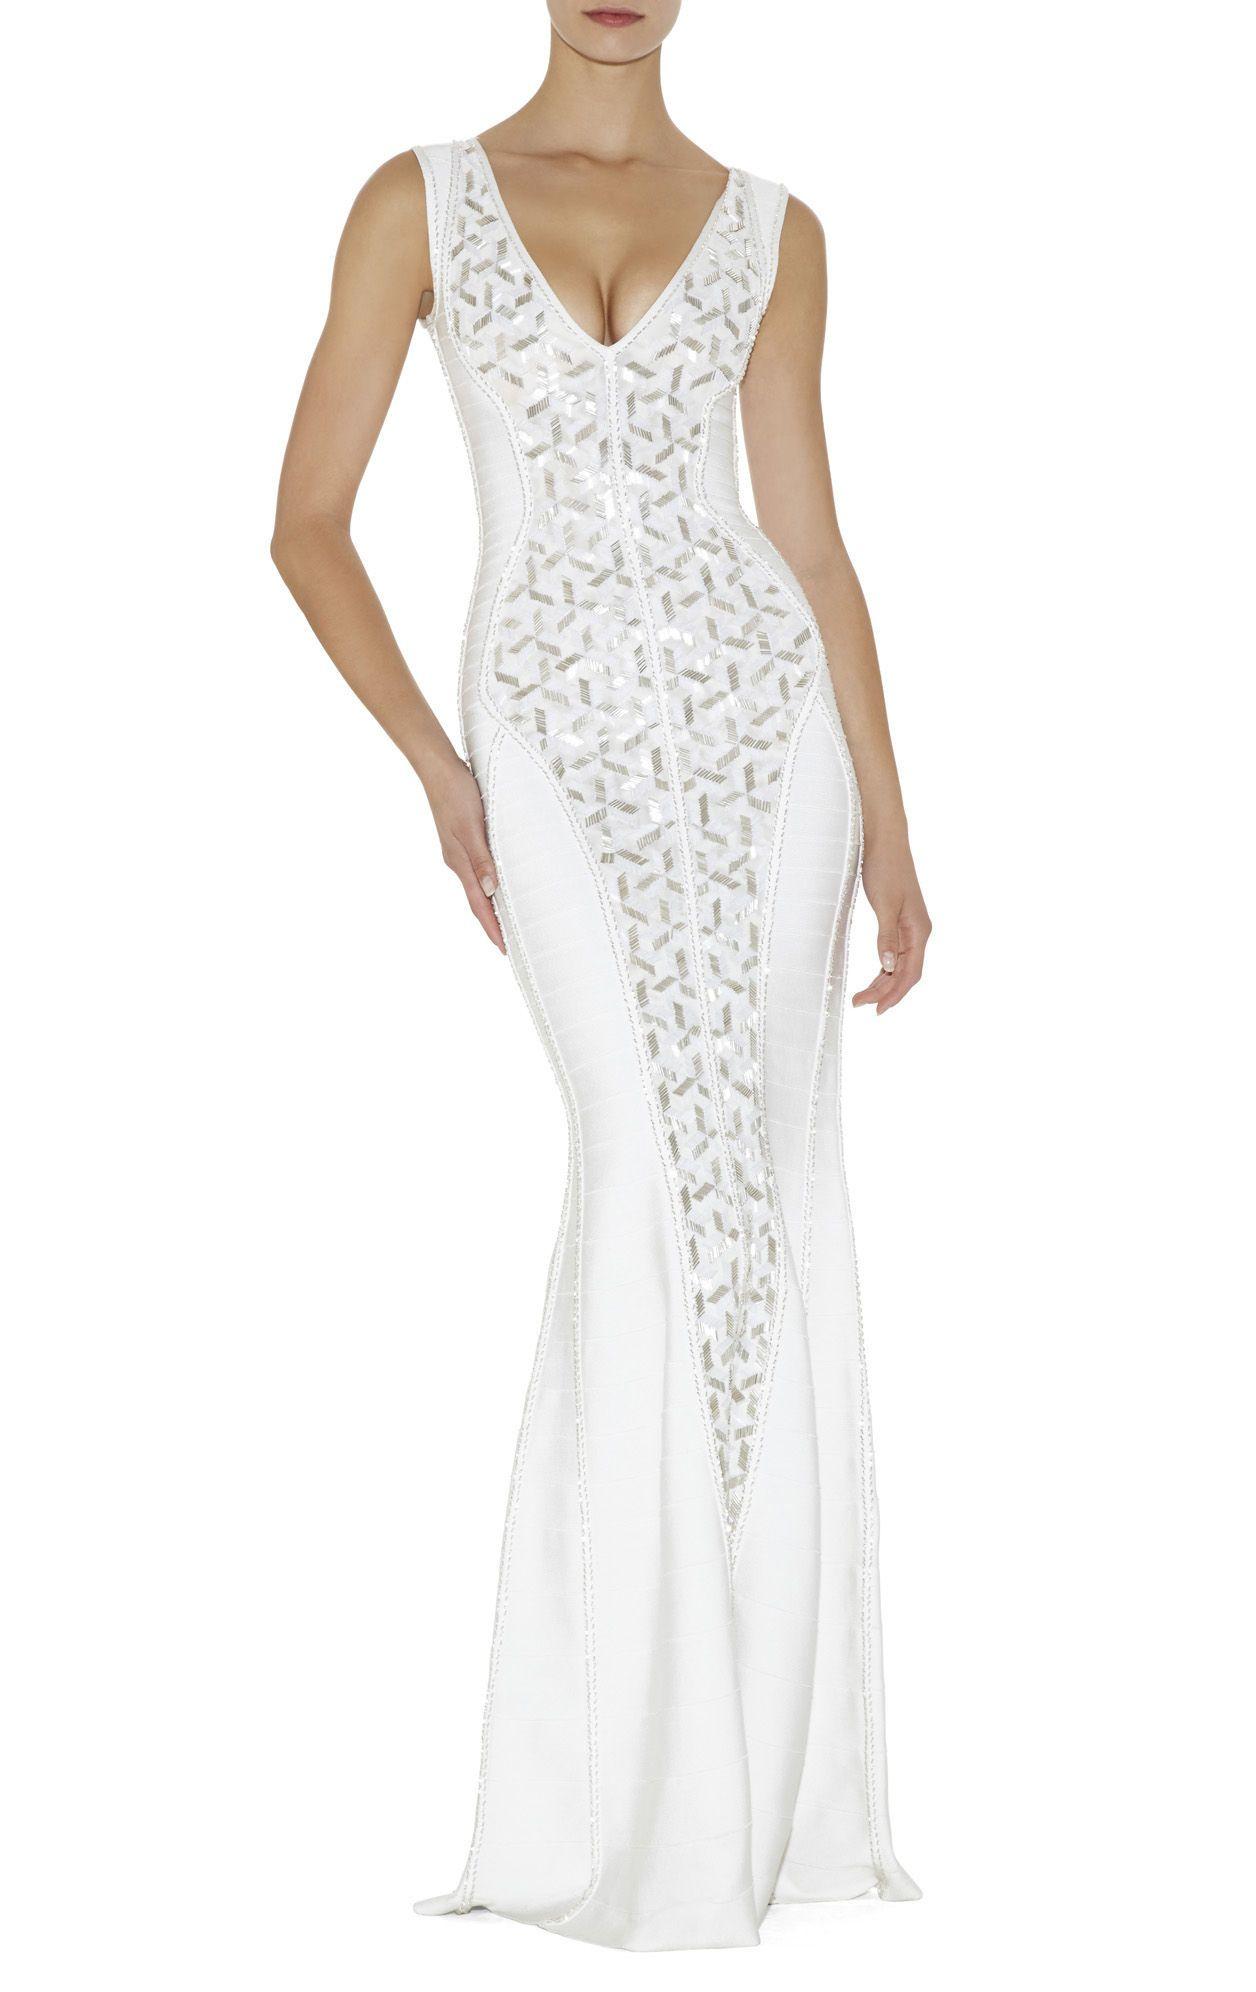 Evangeline geometric beaded dress herve leger fashion woman